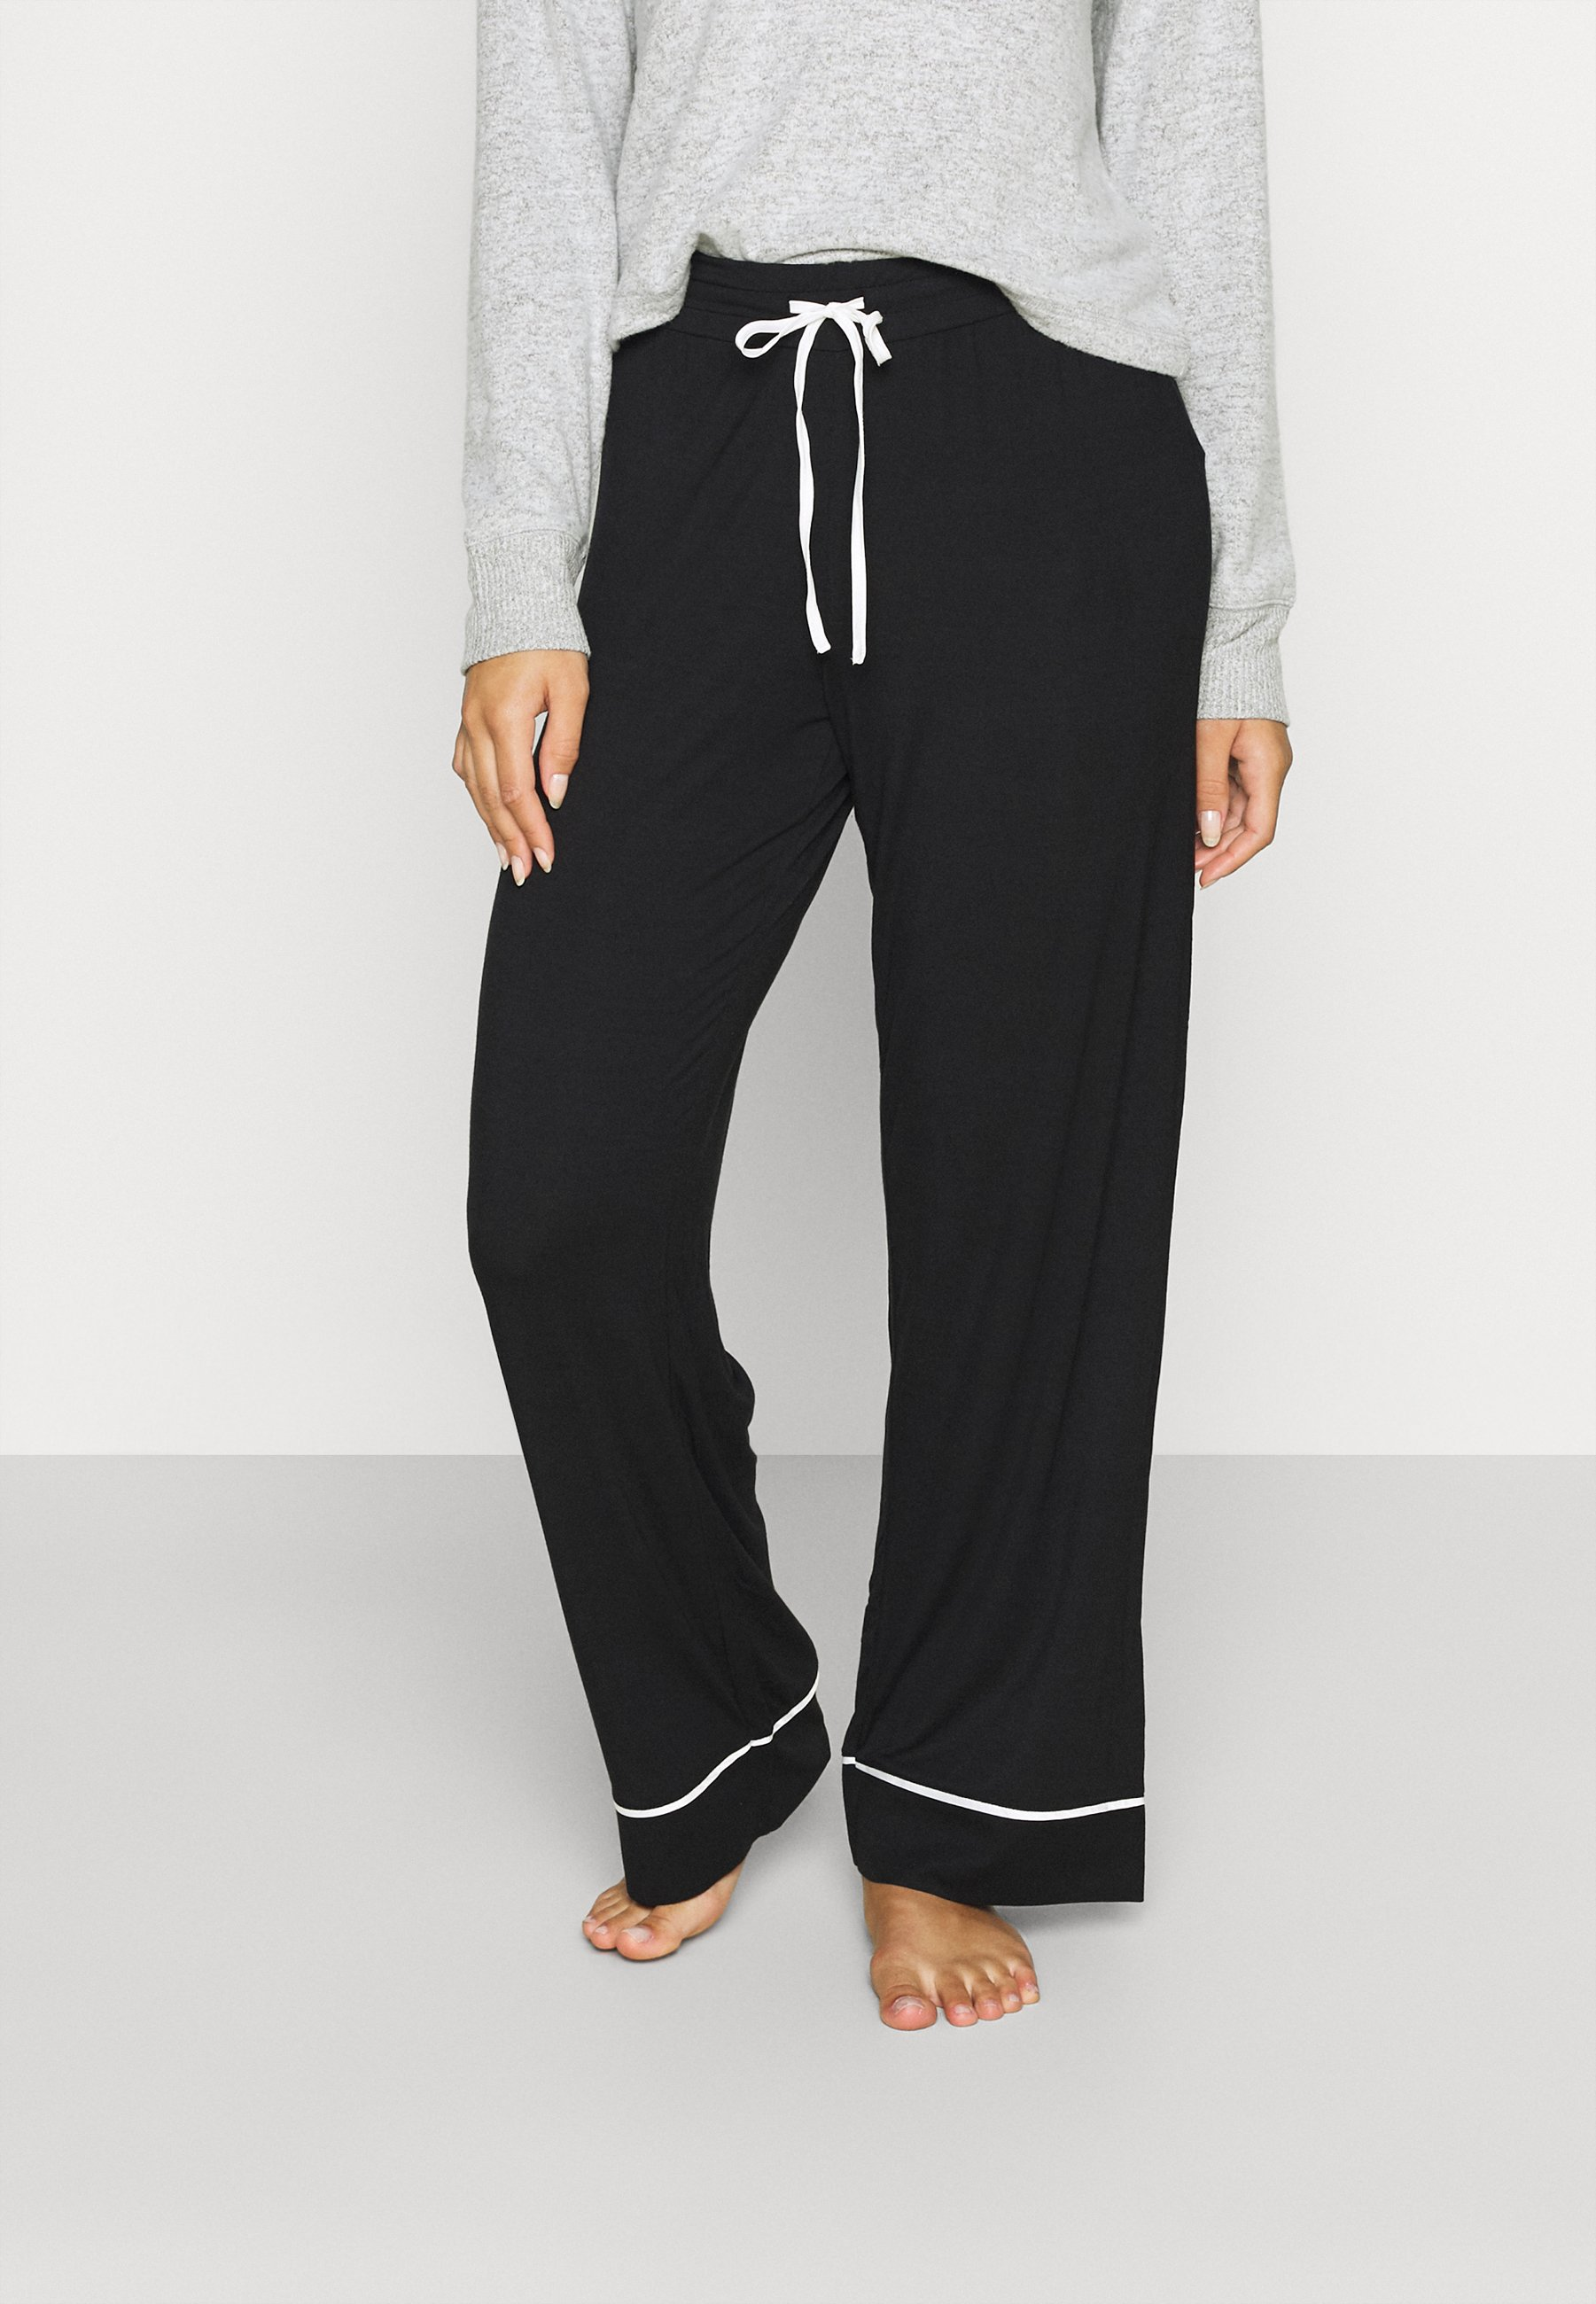 Donna MODAL PIPING PANT - Pantaloni del pigiama